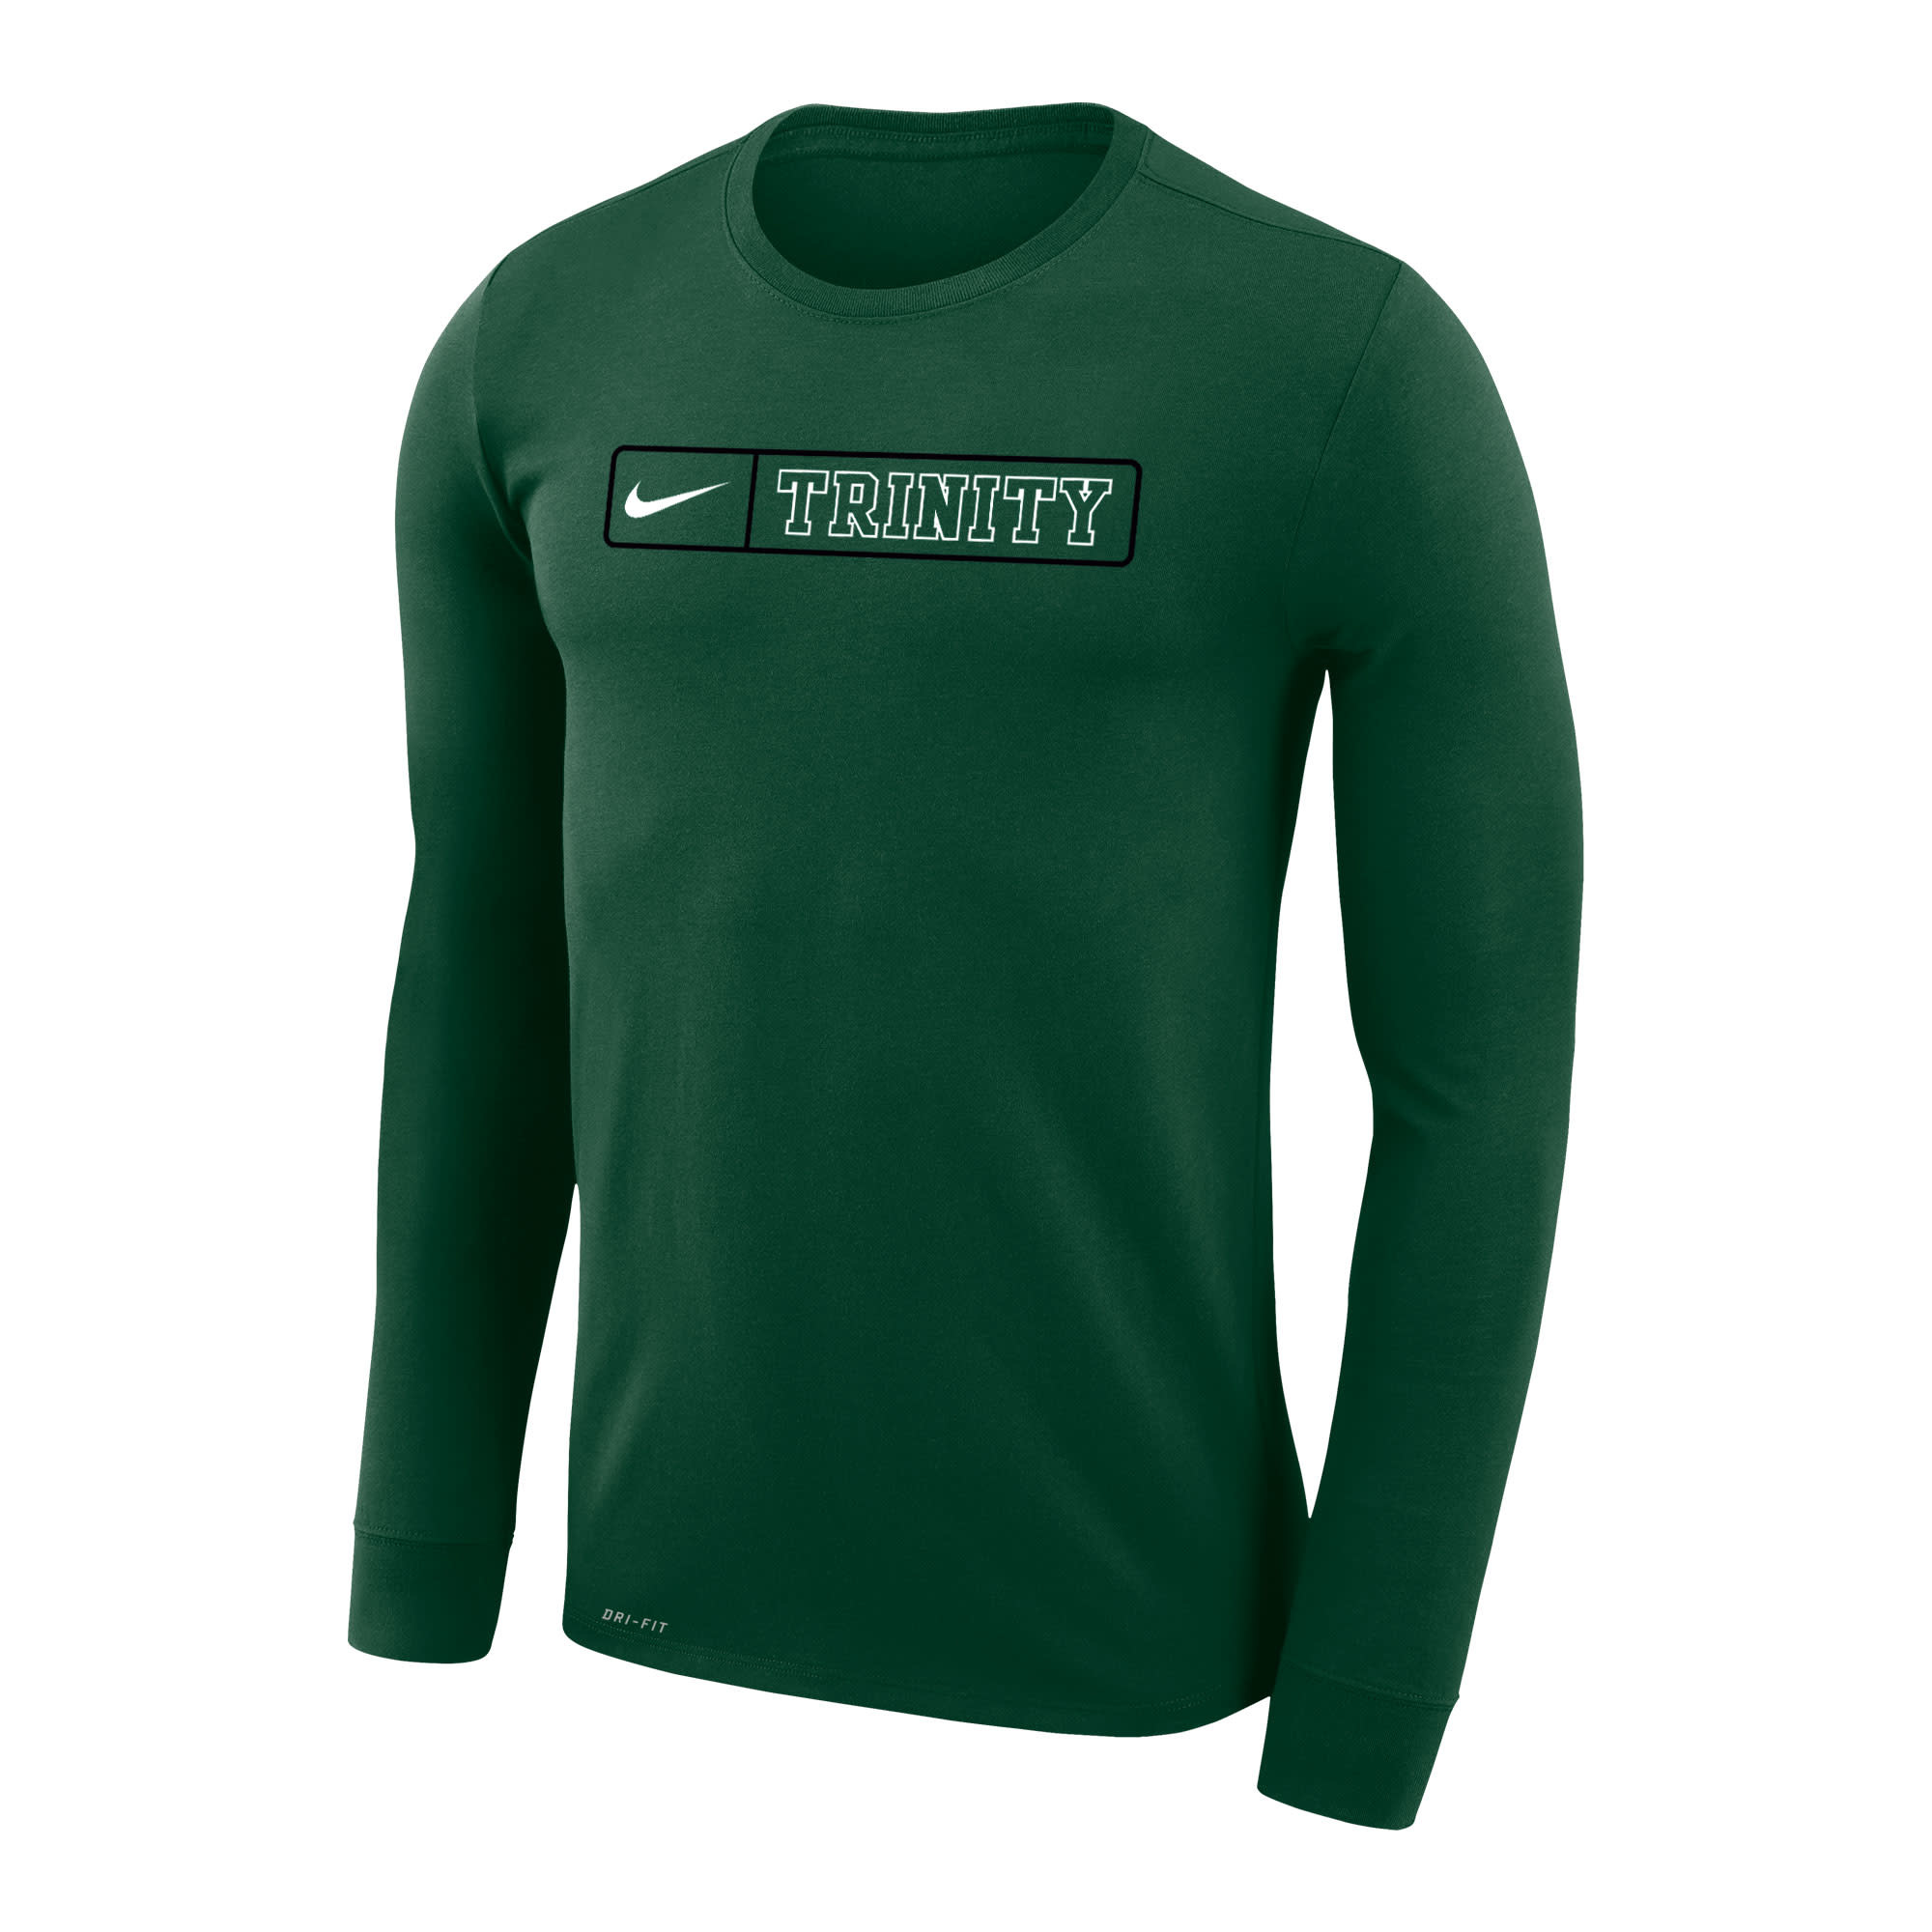 Nike Nike Dri-Fit Green Long Sleeve New for 2020